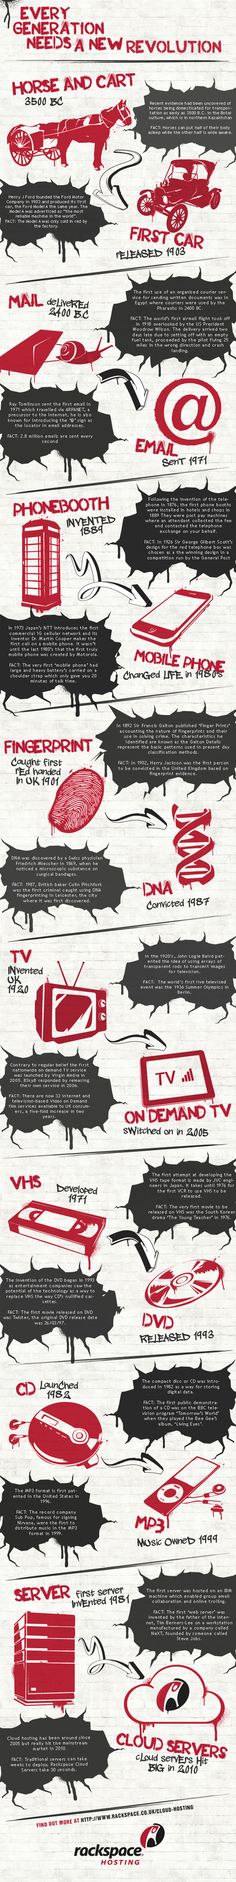 Technological Revolution! [infographic]